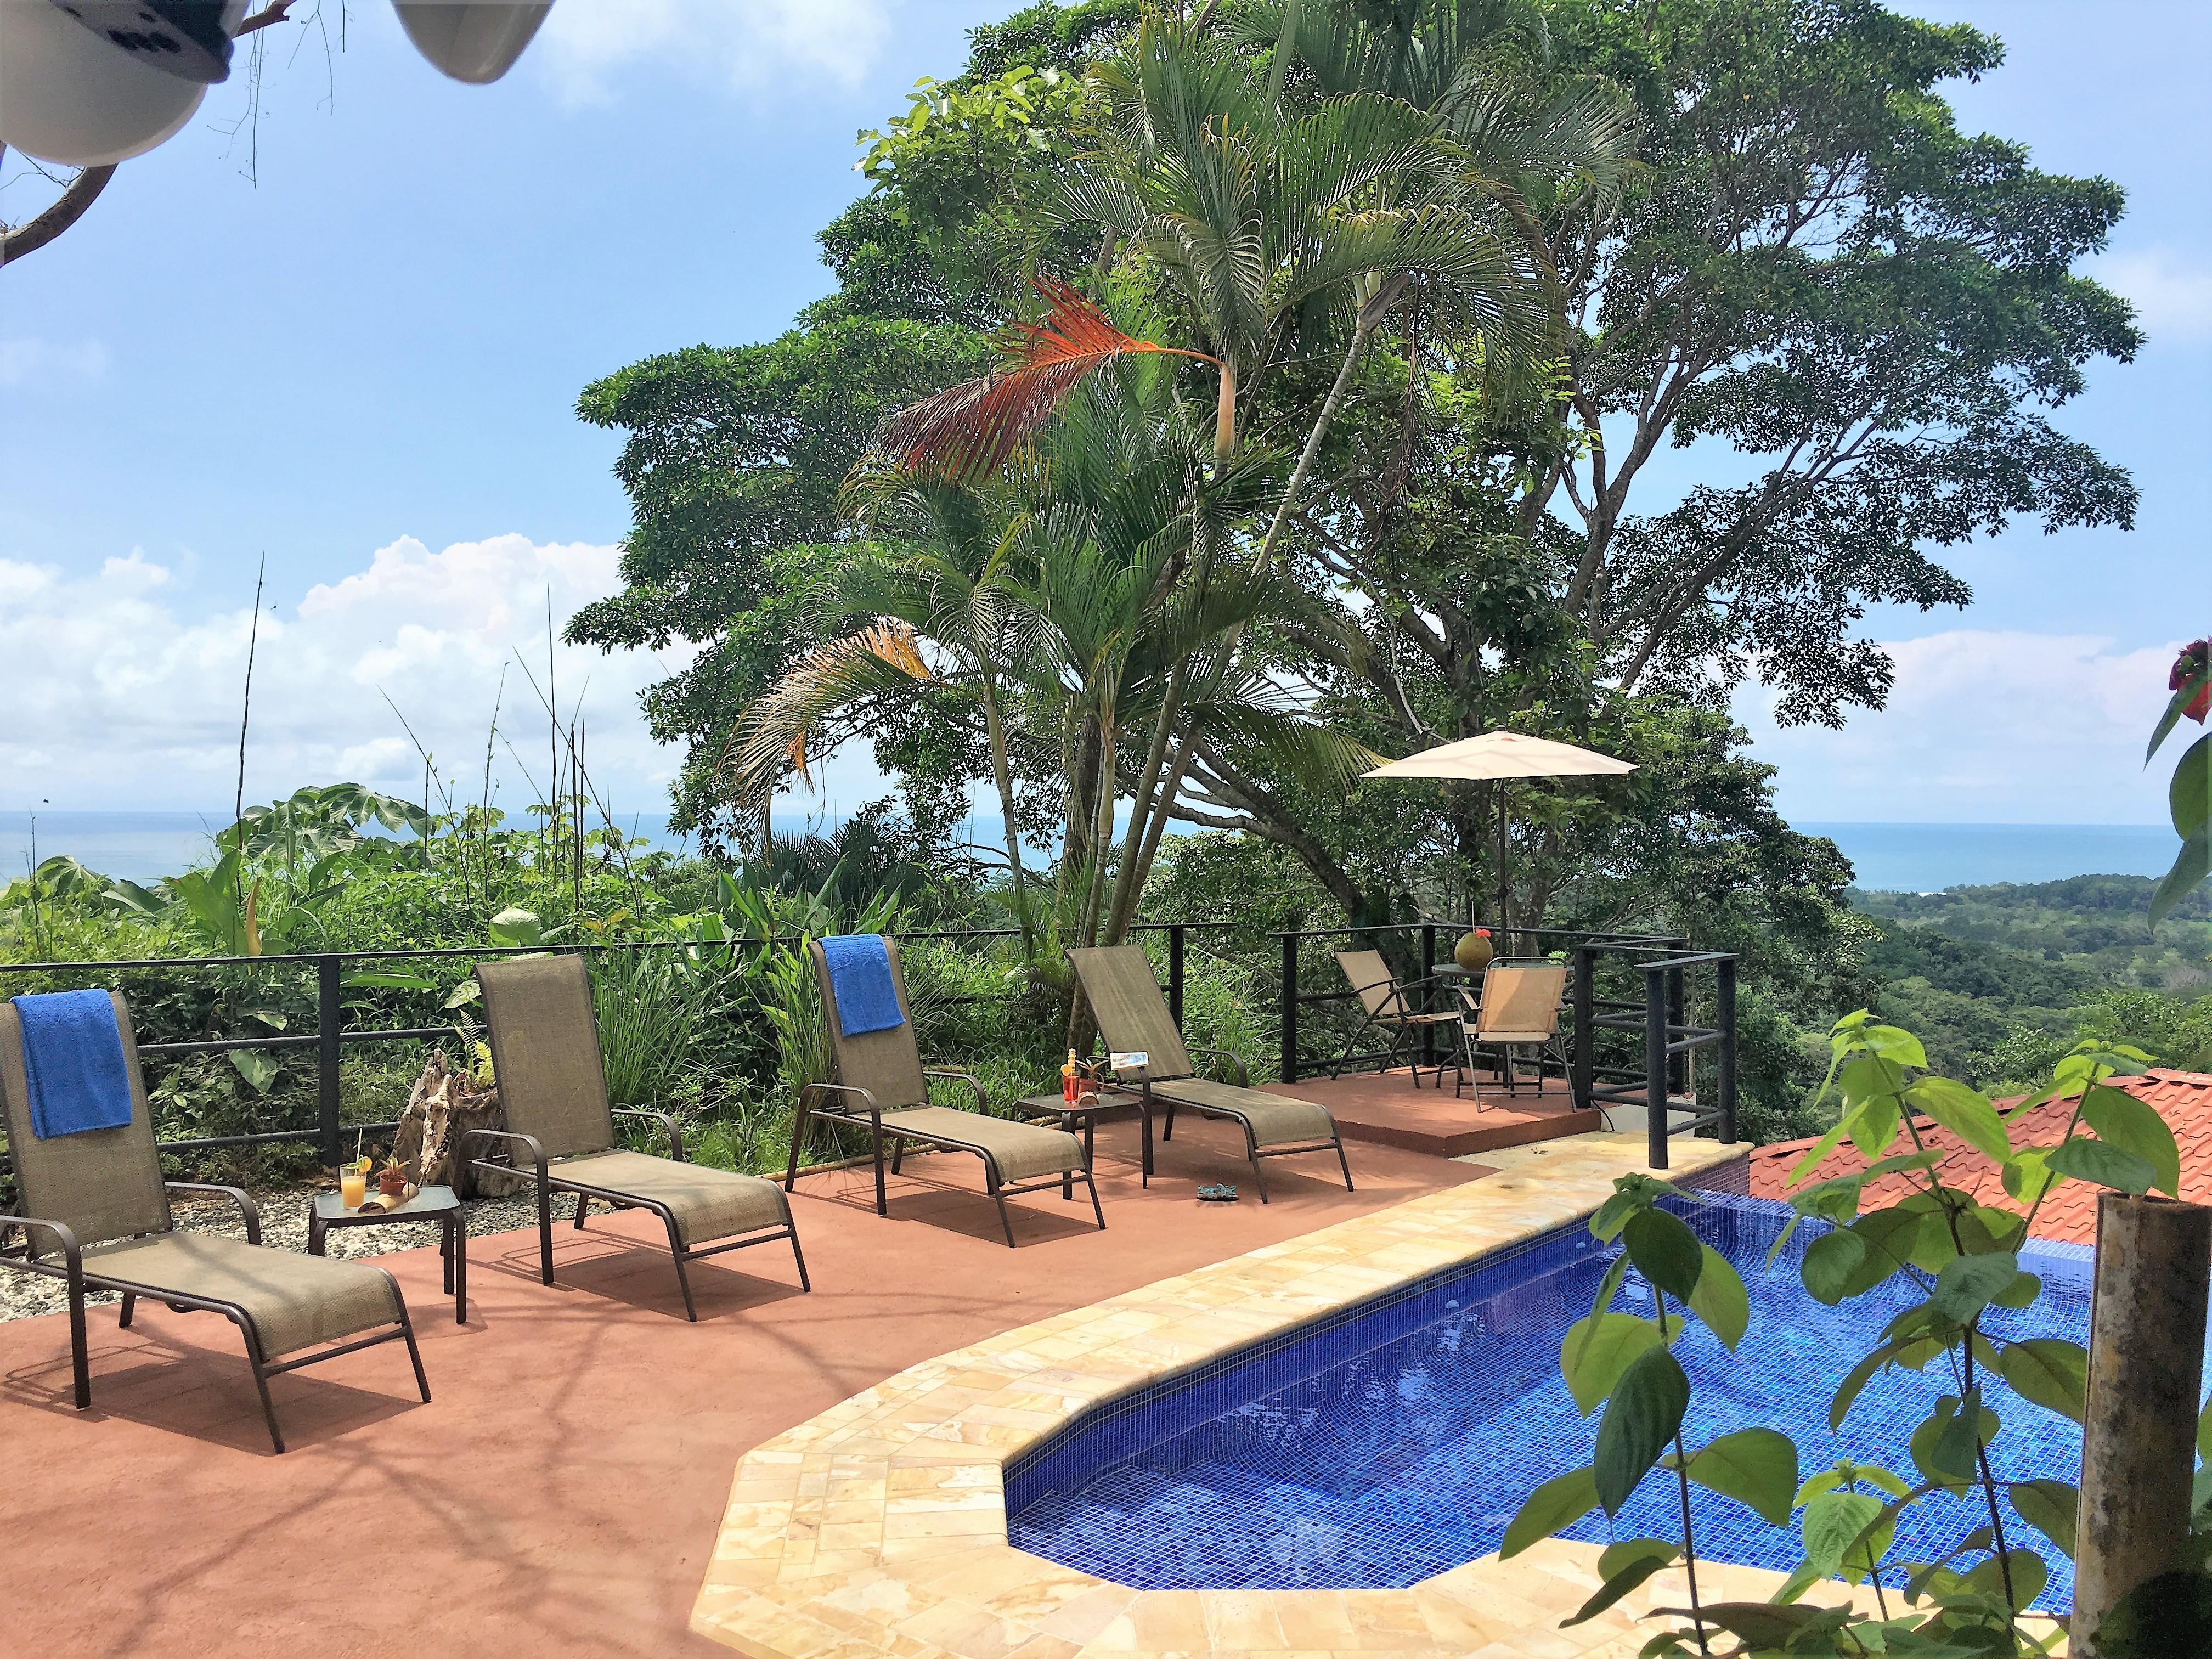 Hatillo-Costa-Rica-property-costaricarealestateHAT087-9.jpg